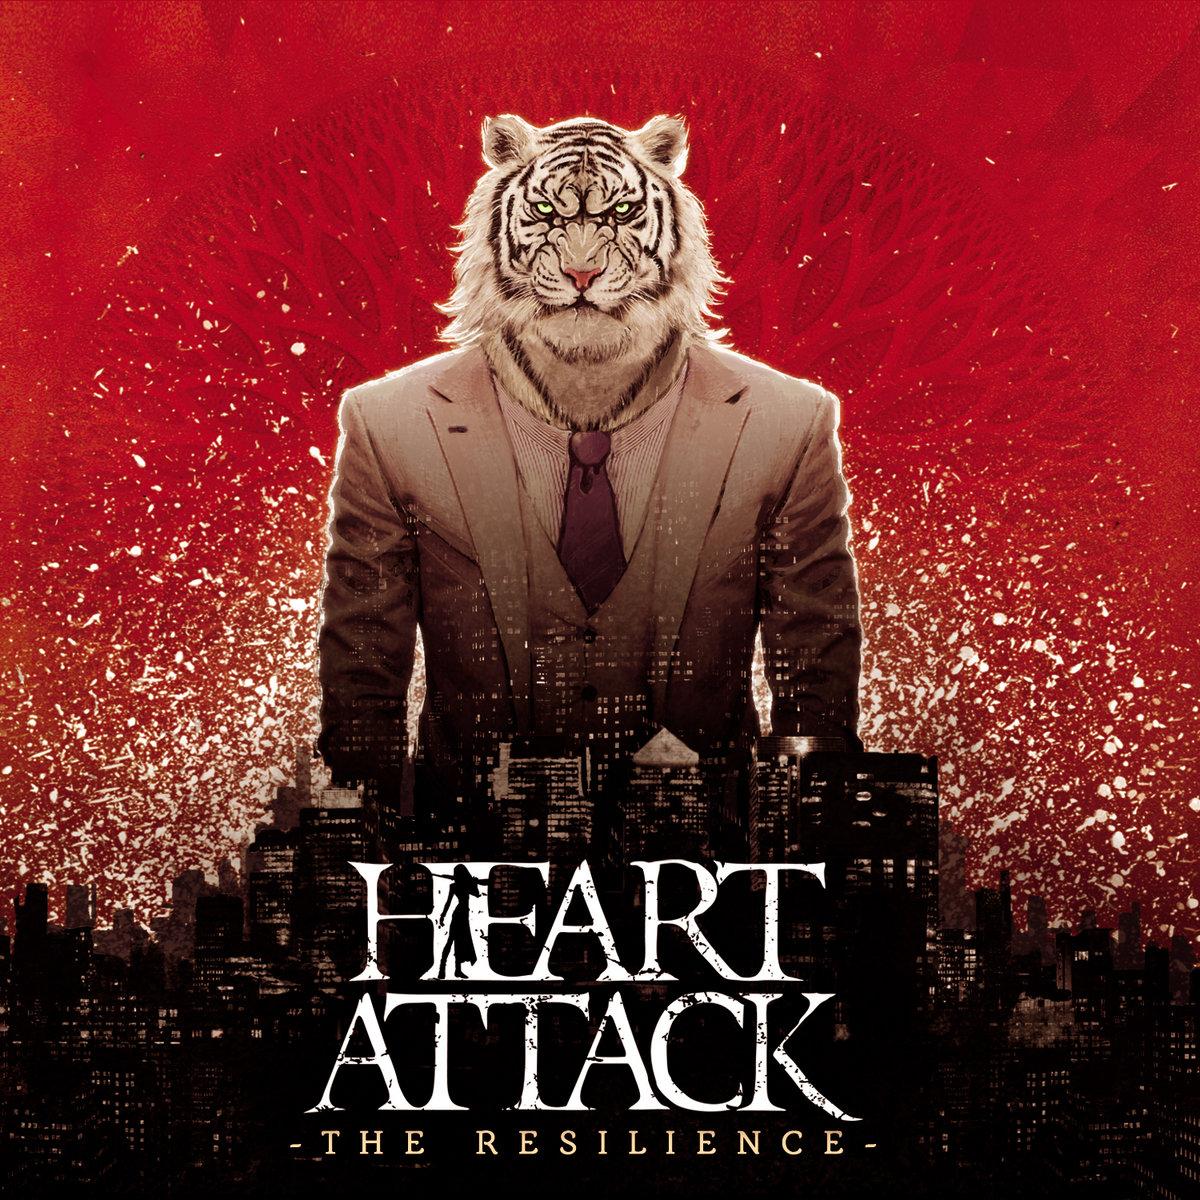 Burn My Flesh | Heart Attack